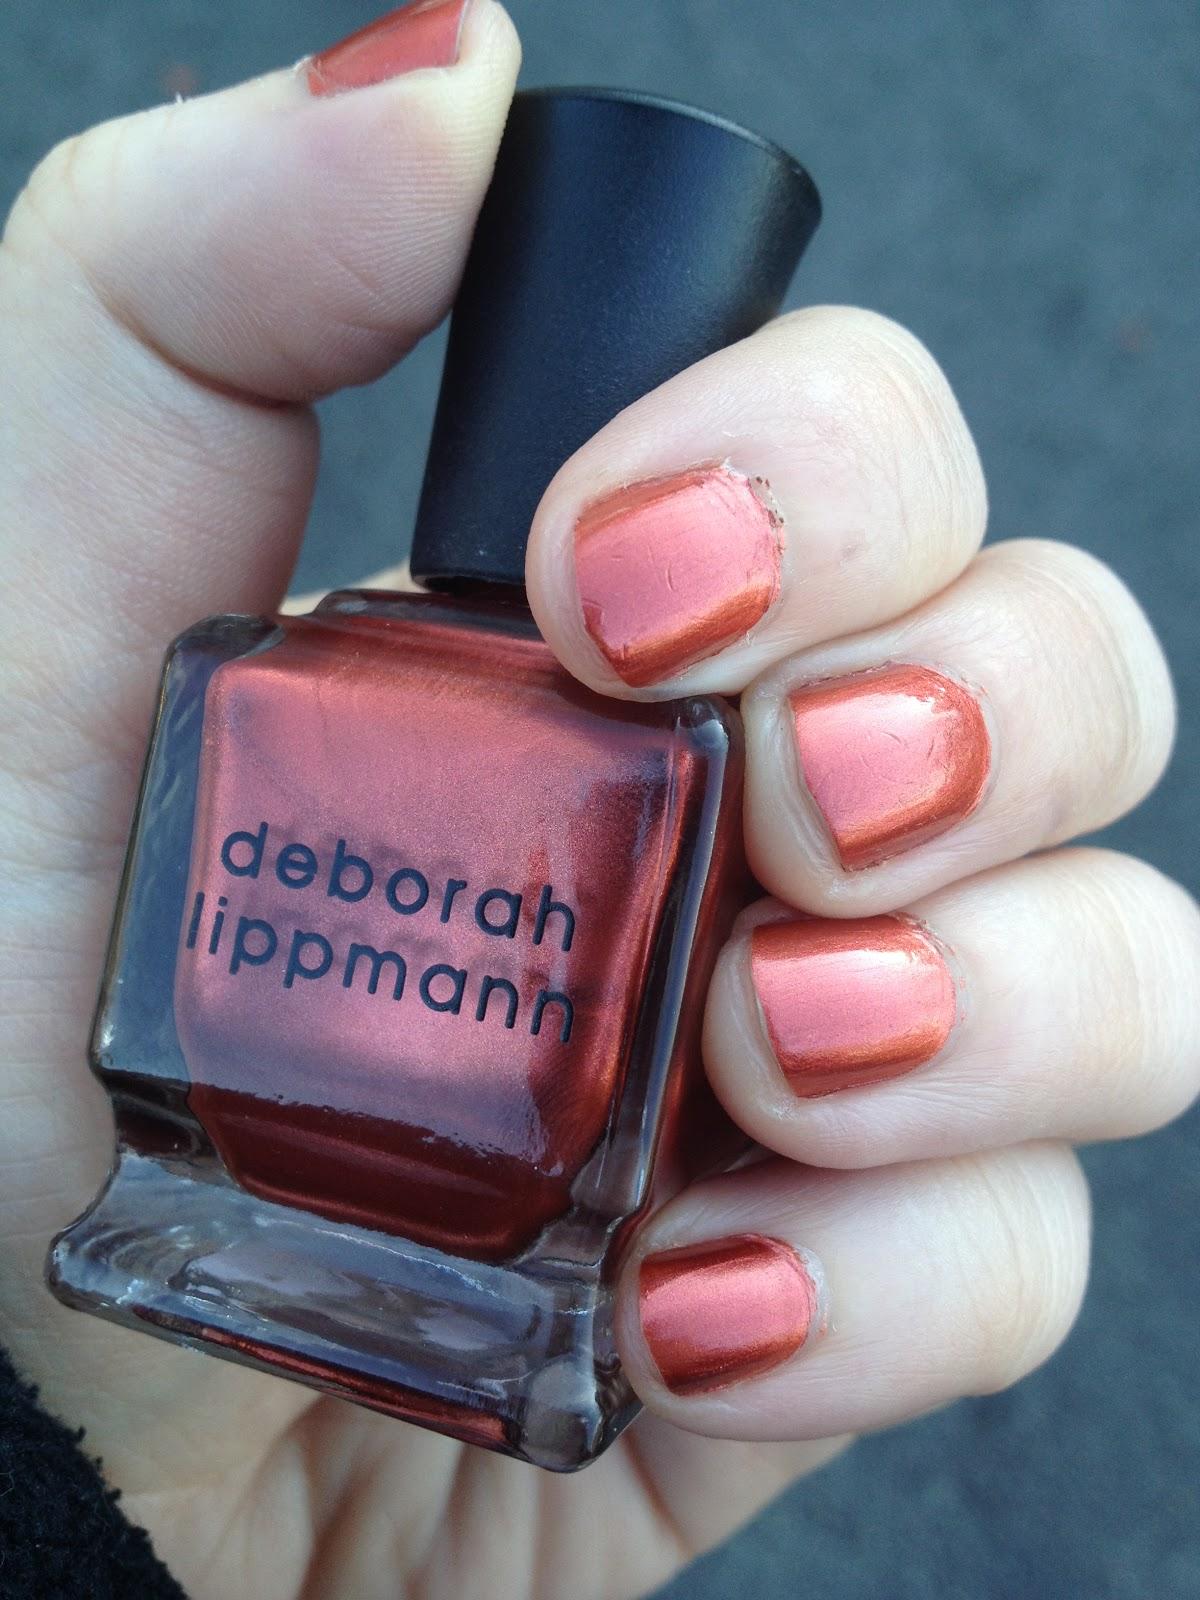 nycmakeuplover : Deborah Lippmann Brick House Nail Lacquer Review ...